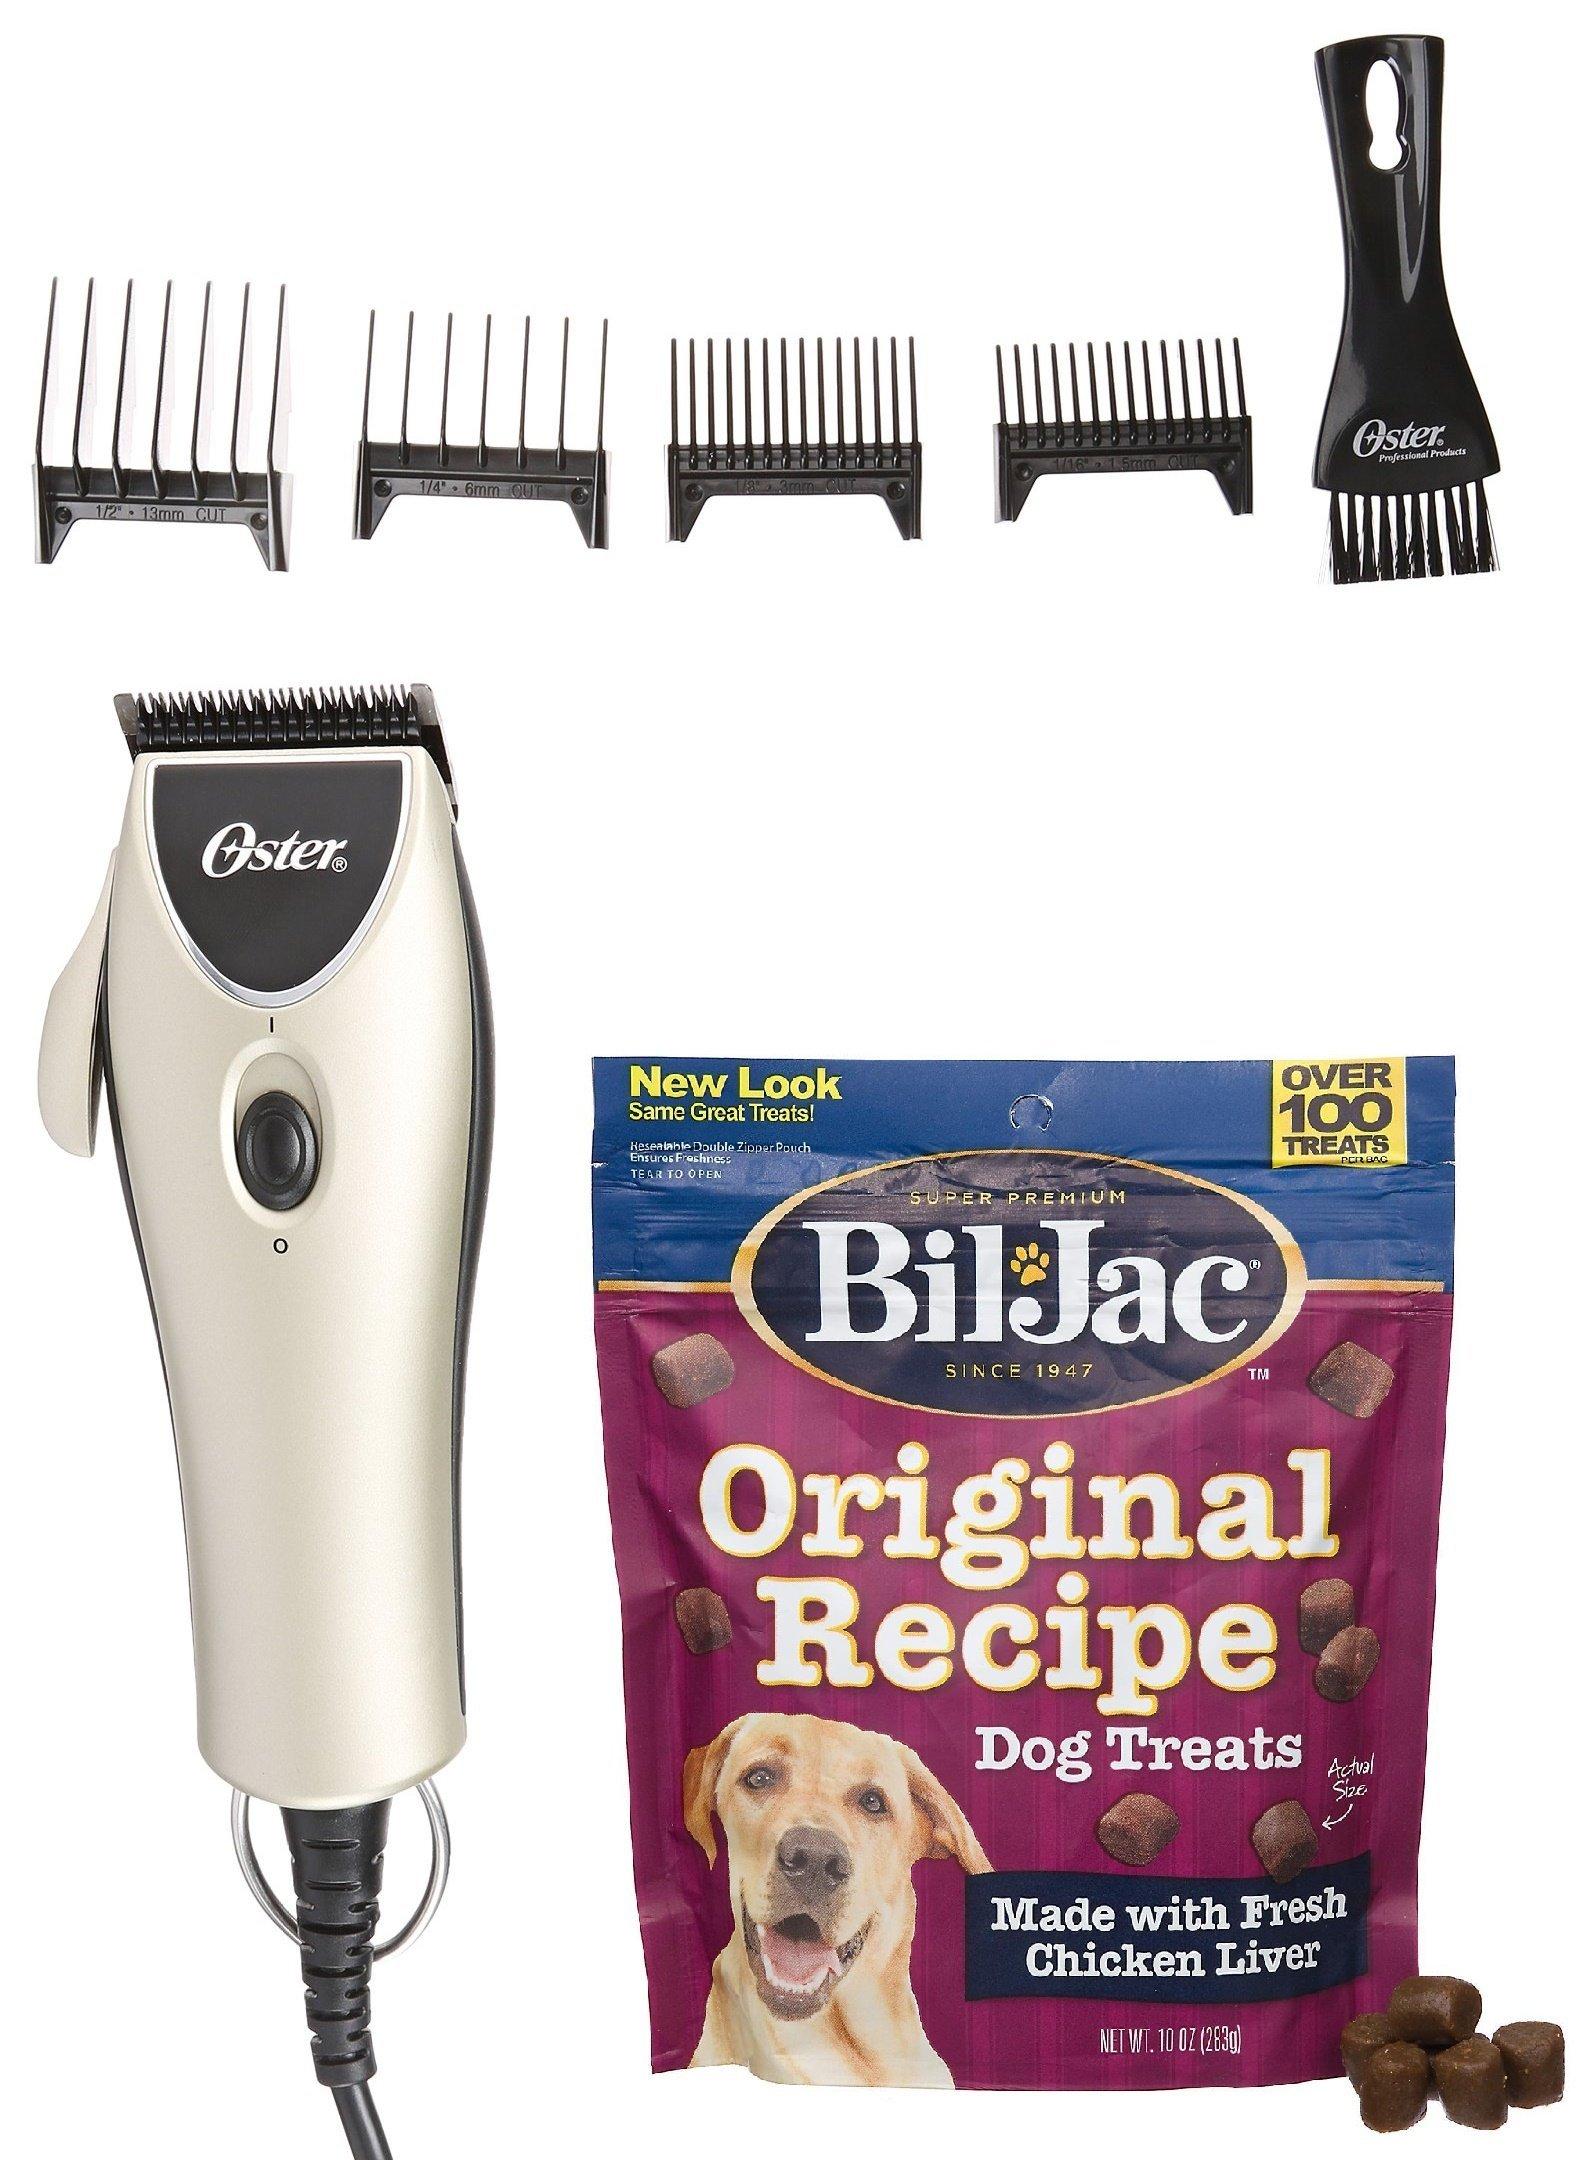 Oster Performance Grooming Kit - Includes Bil-Jac Original Recipe Dog Treats 10oz